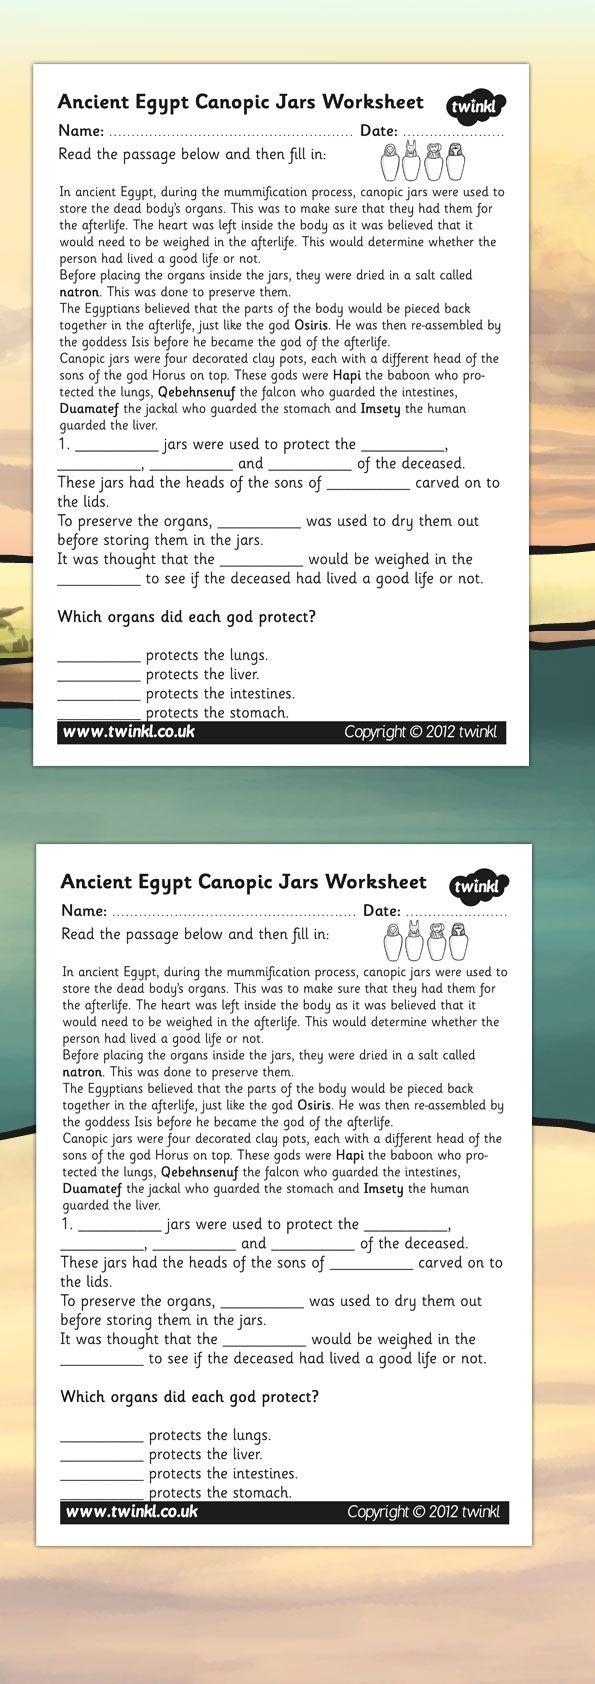 Workbooks psychology worksheets : Ancient Egypt- Canopic Jars Comprehension Worksheet | EGYPTIAN ART ...